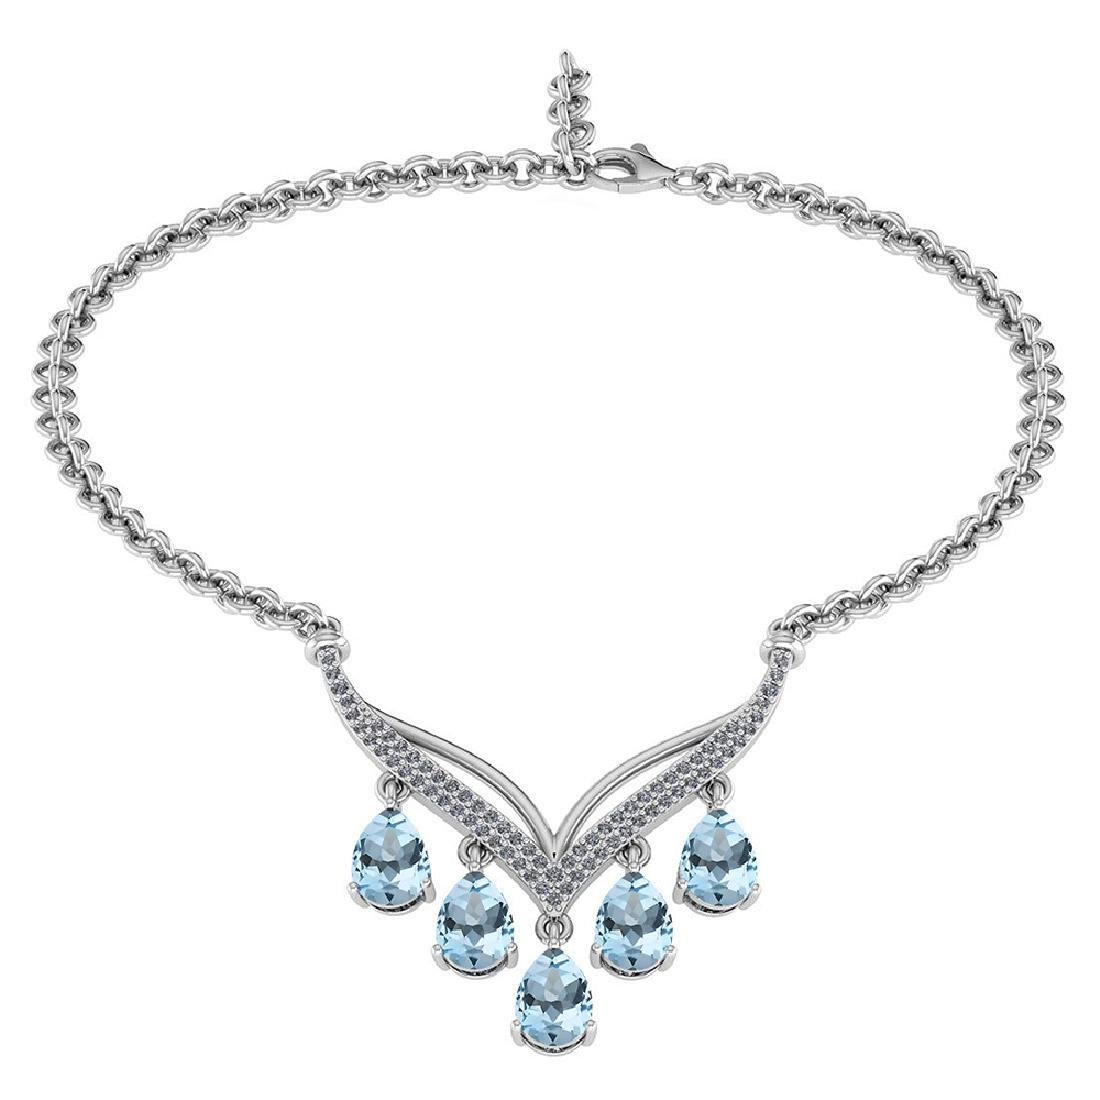 Certified 4.19 CTW Genuine Aquamarine And Diamond 14k W